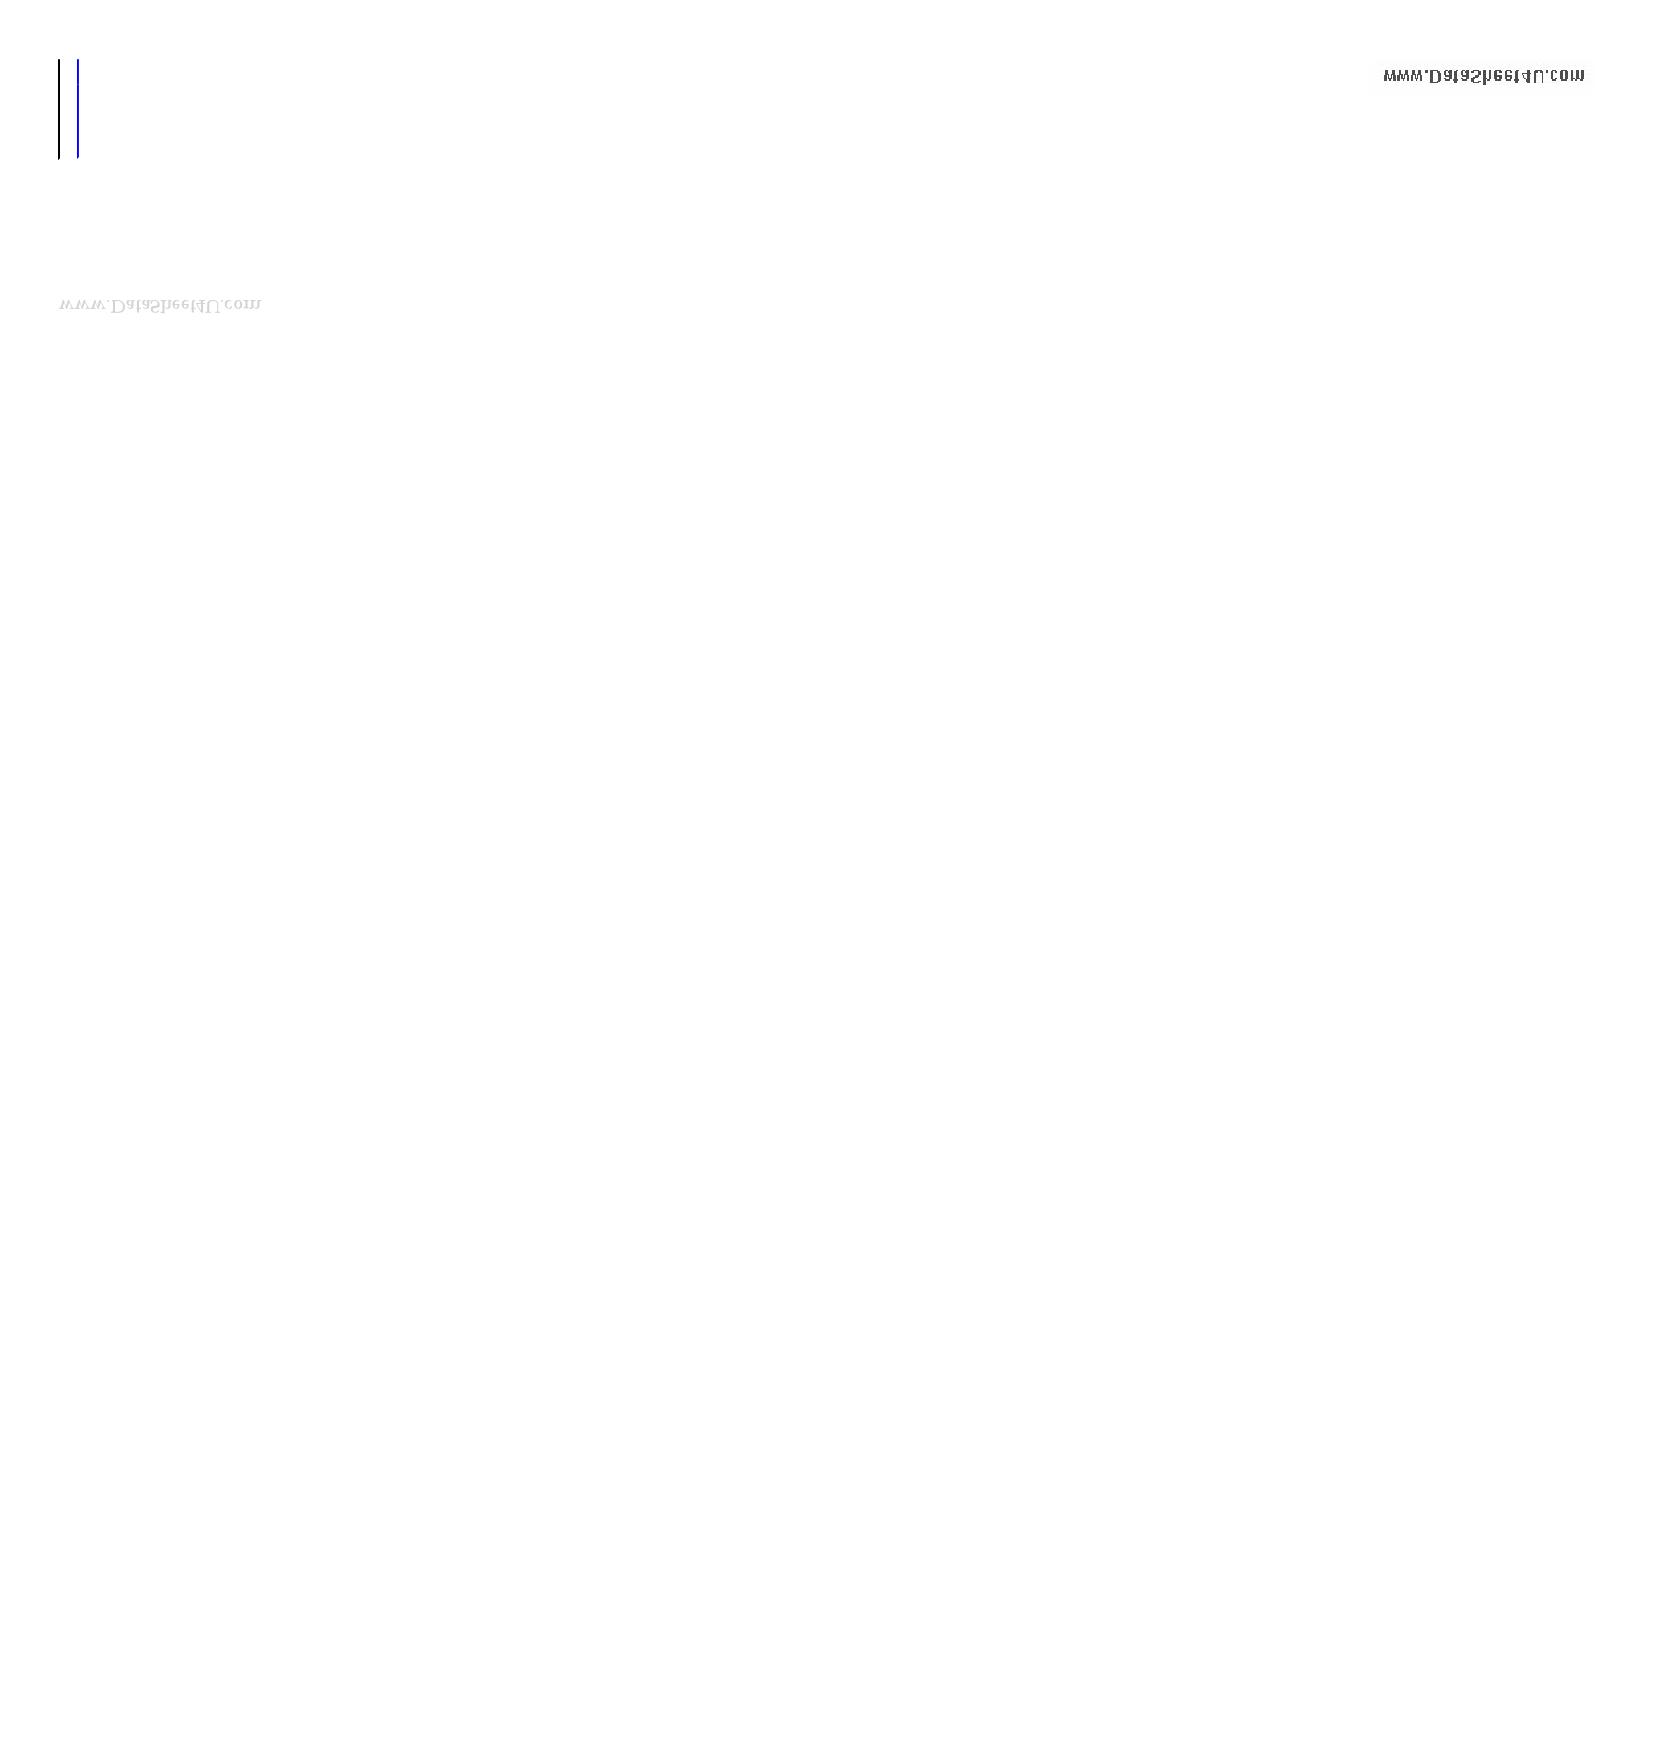 901617 Даташит, Описание, Даташиты